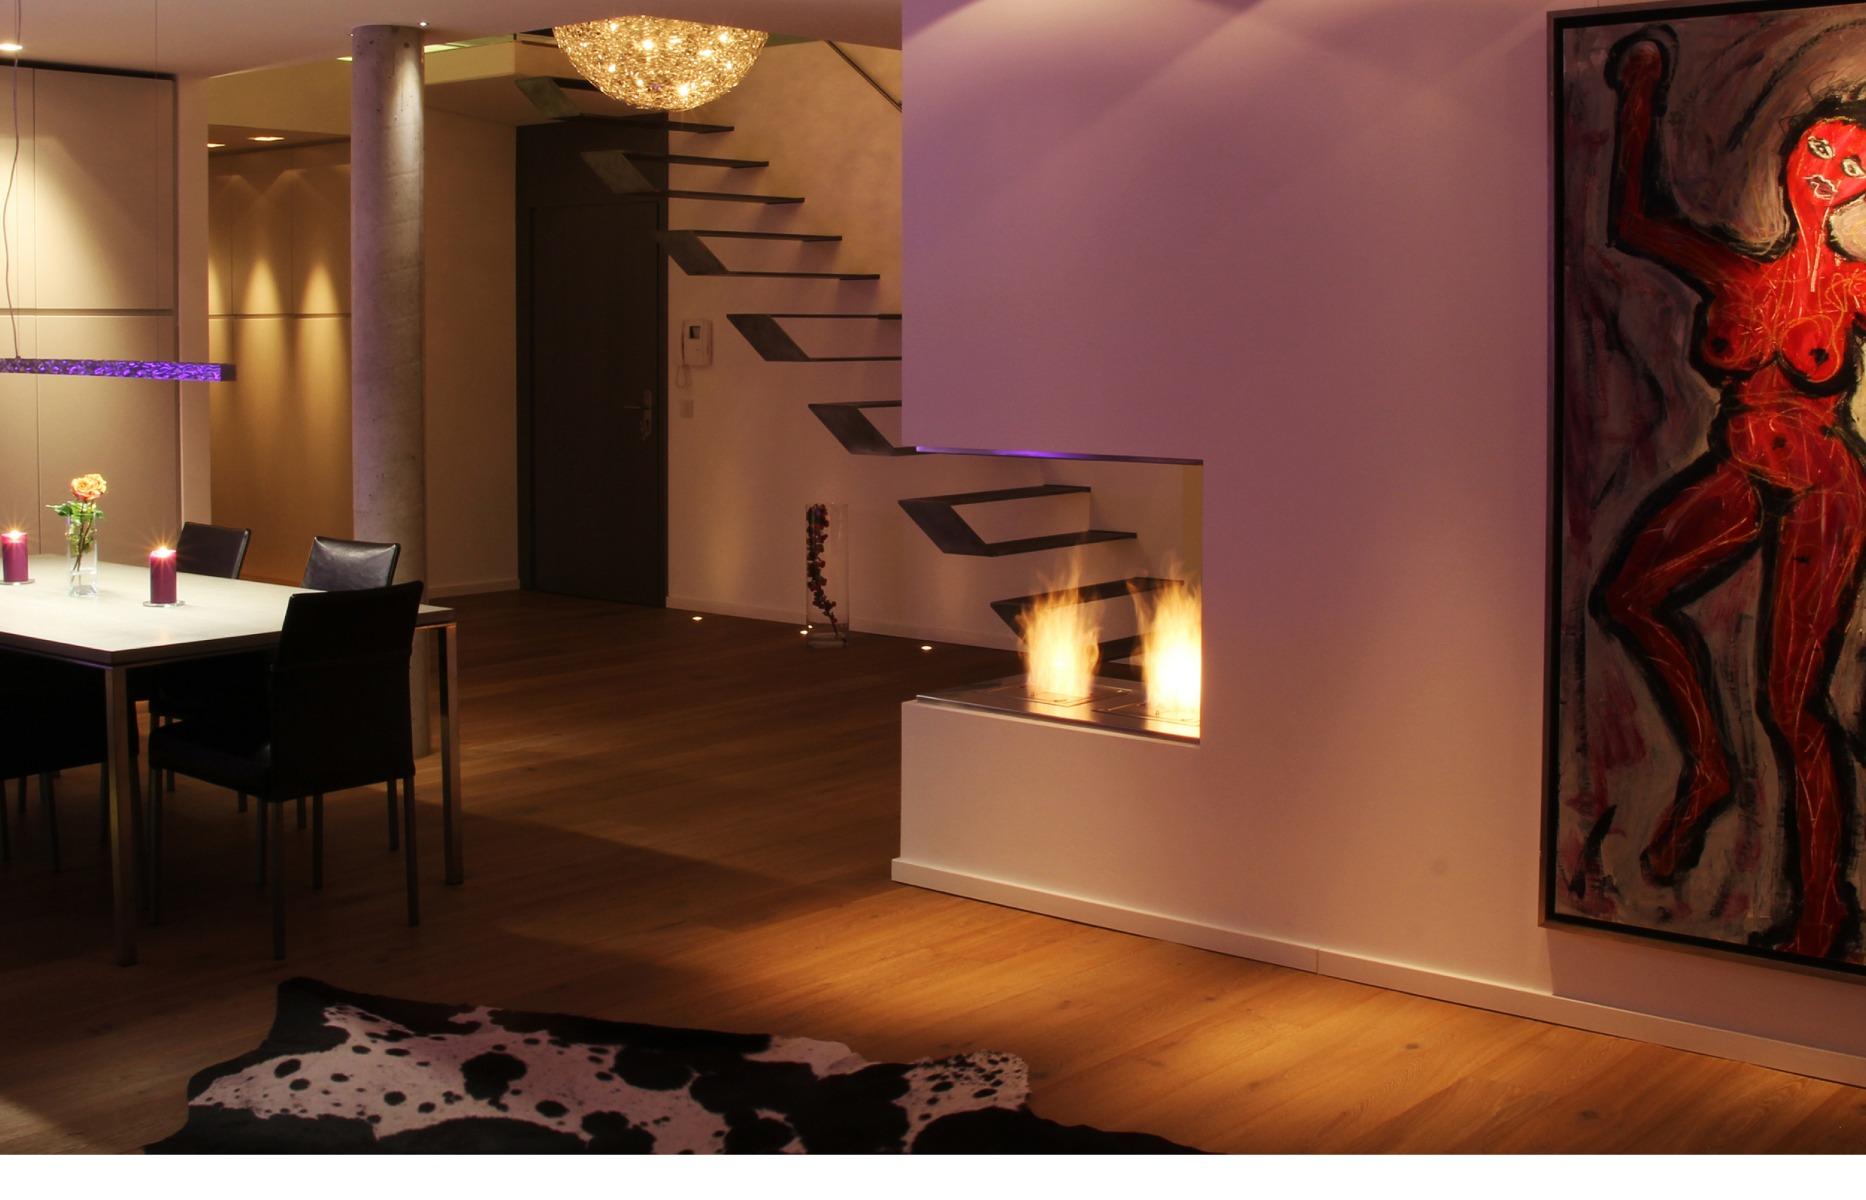 EcoSmart Fire BK5 burner corner fireplace